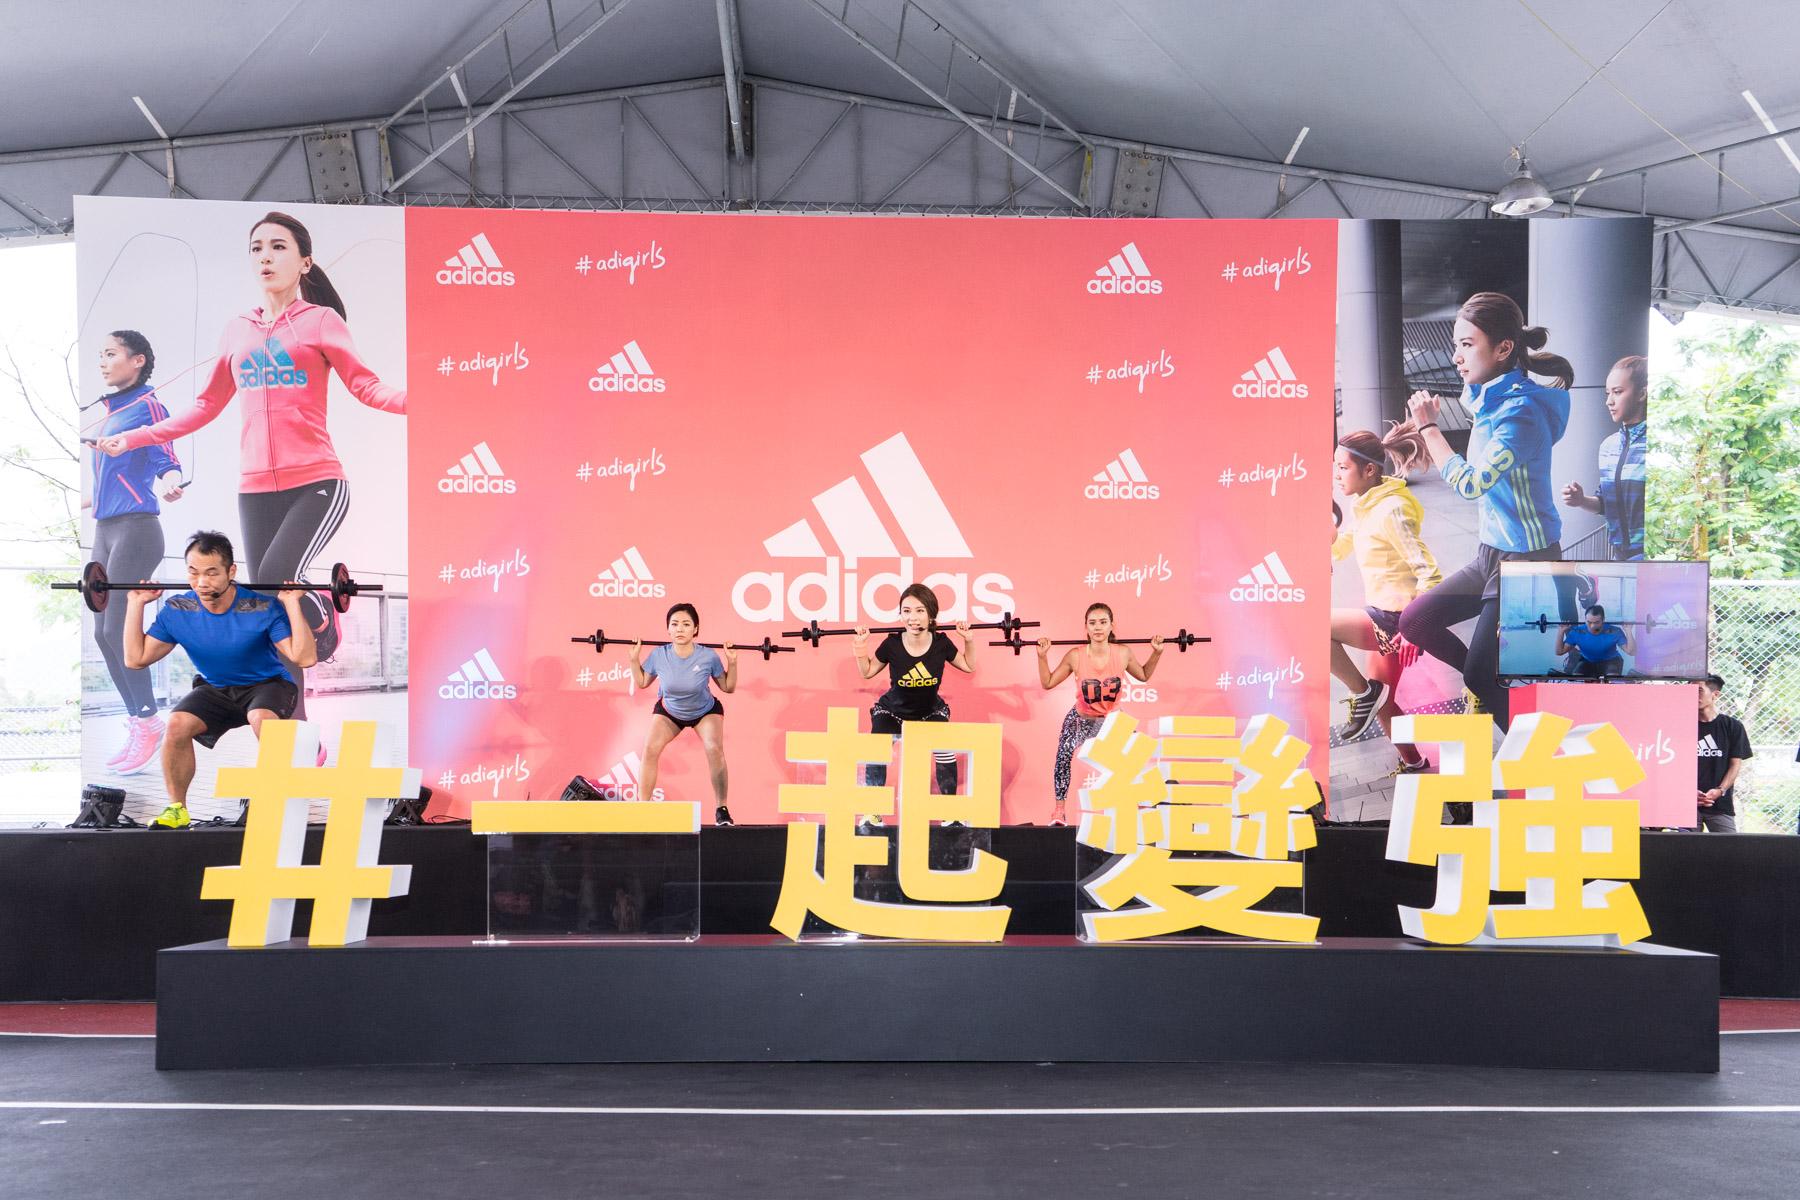 adidas-adigirls press conference 20150924-8